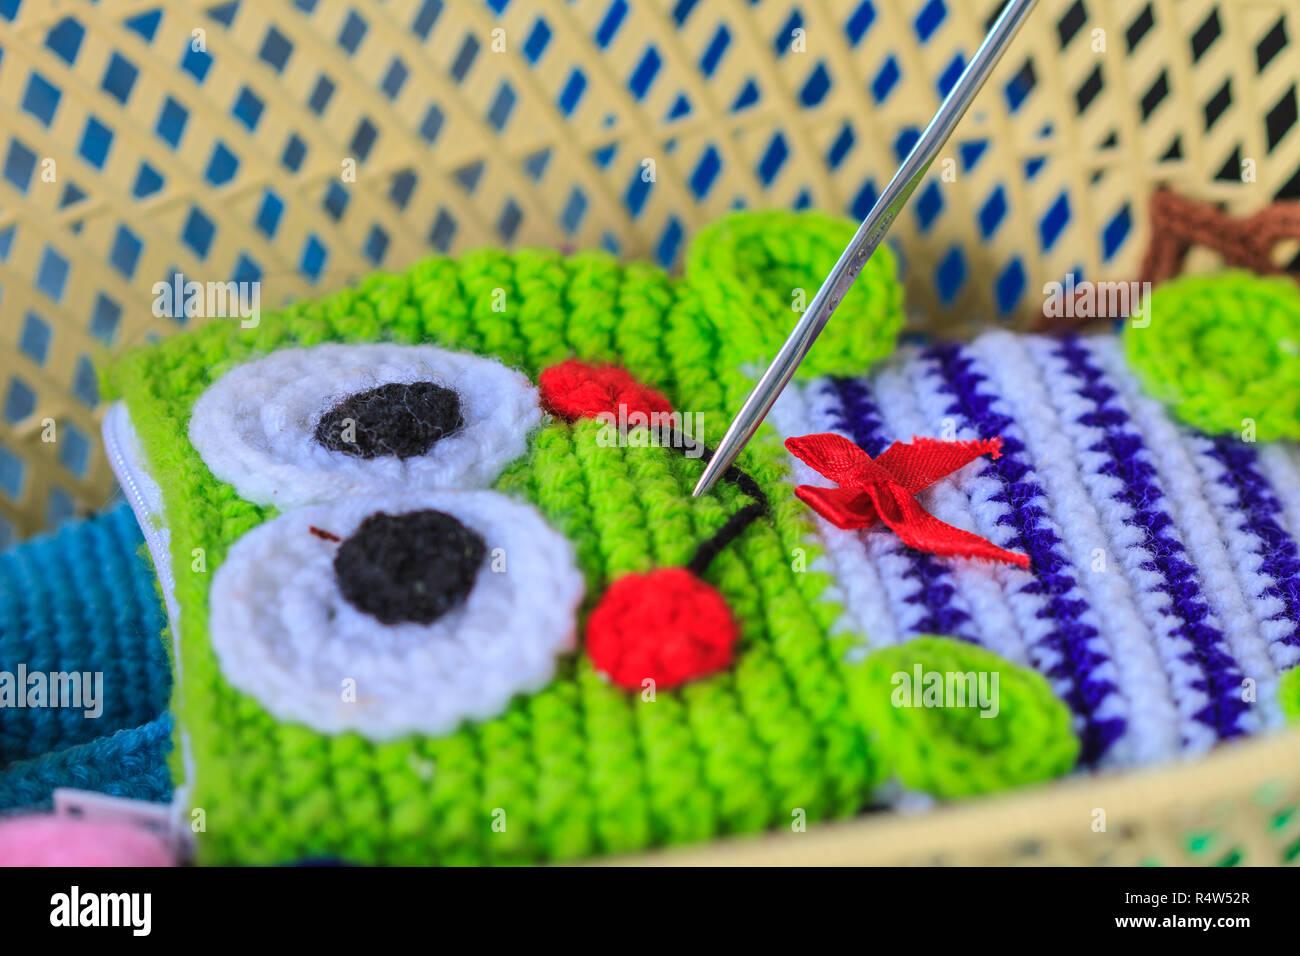 Crochet Hook Needle Handmade Art And Crafts Stock Photo Alamy